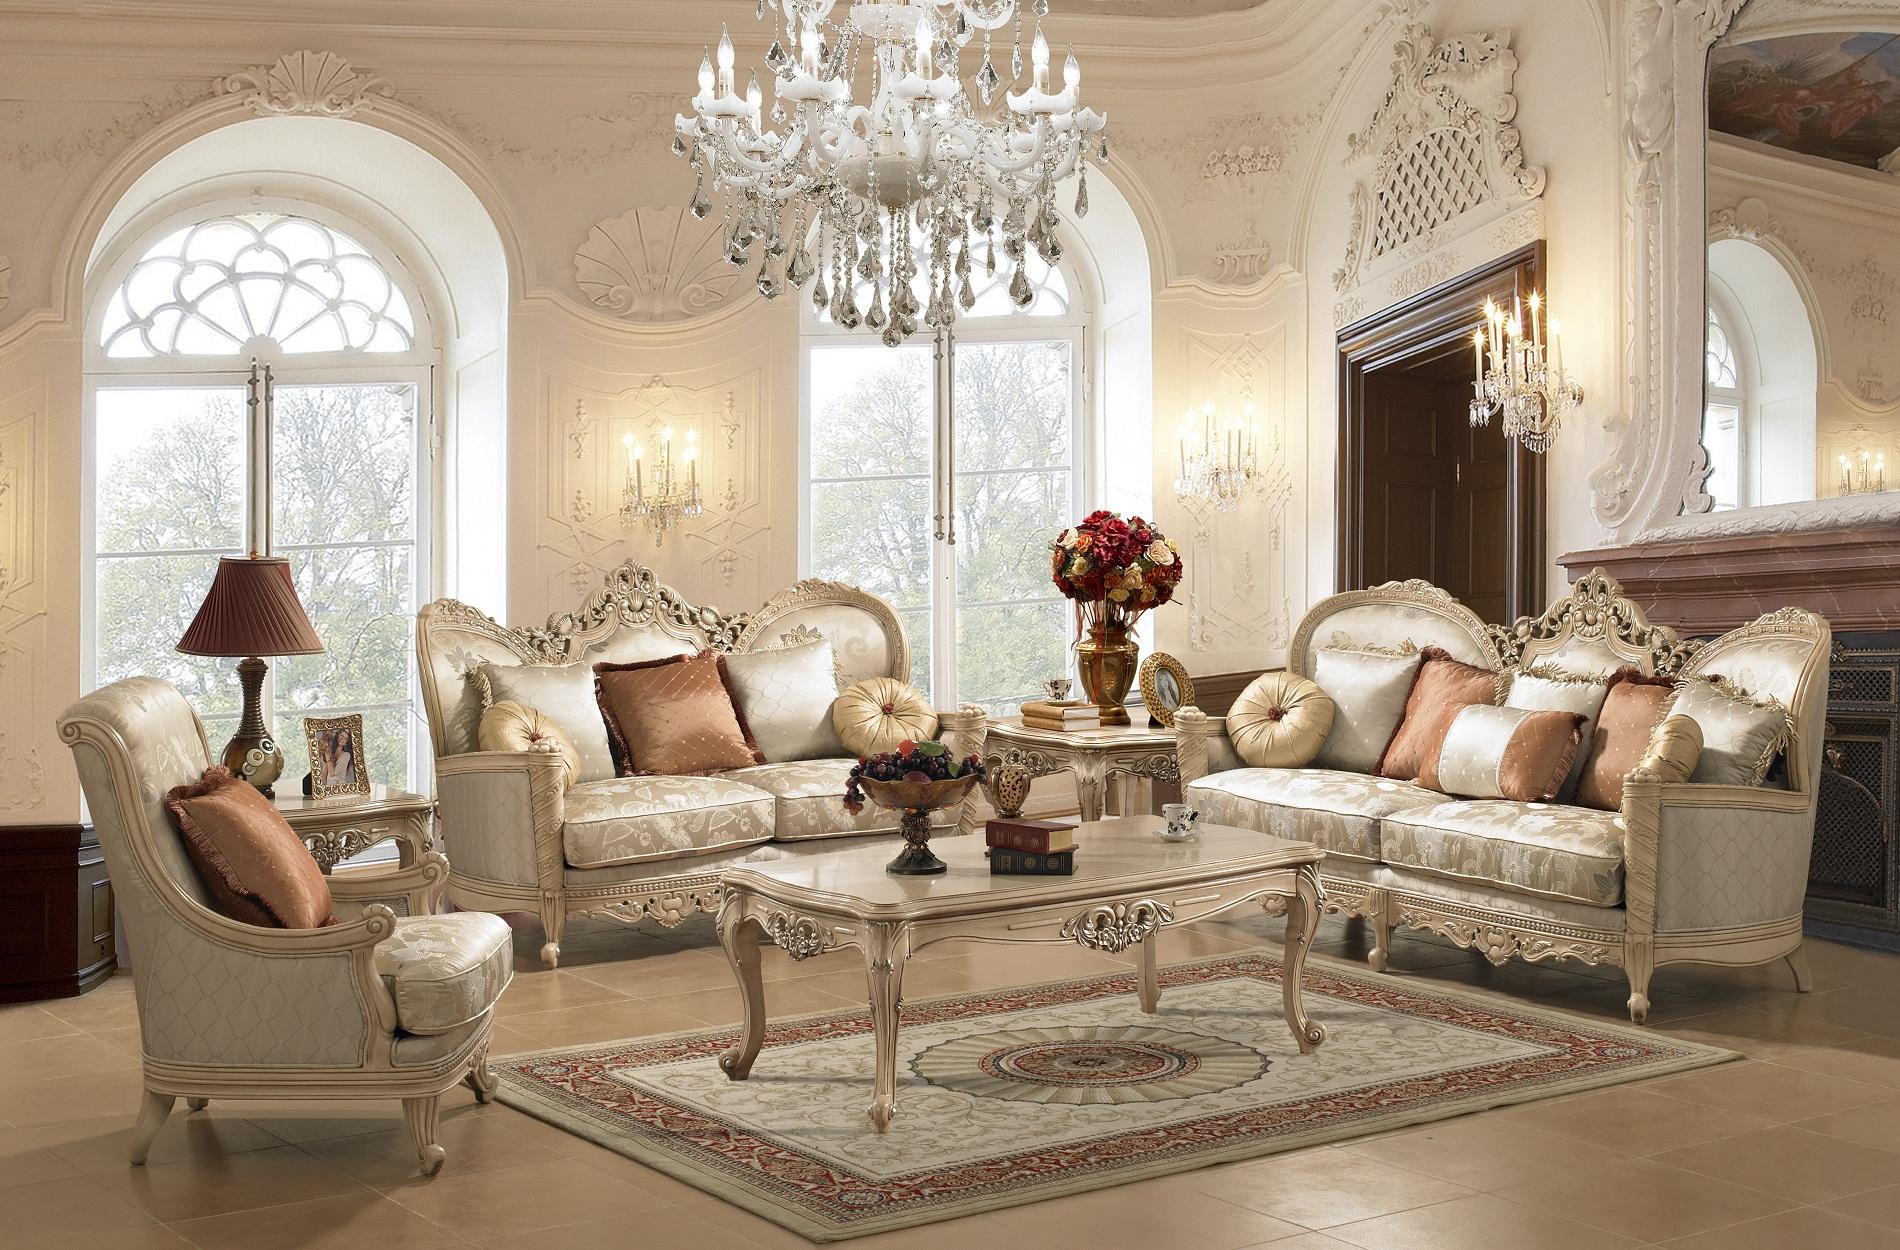 Elegant Living Room Ideas  Fotolipcom Rich image and wallpaper